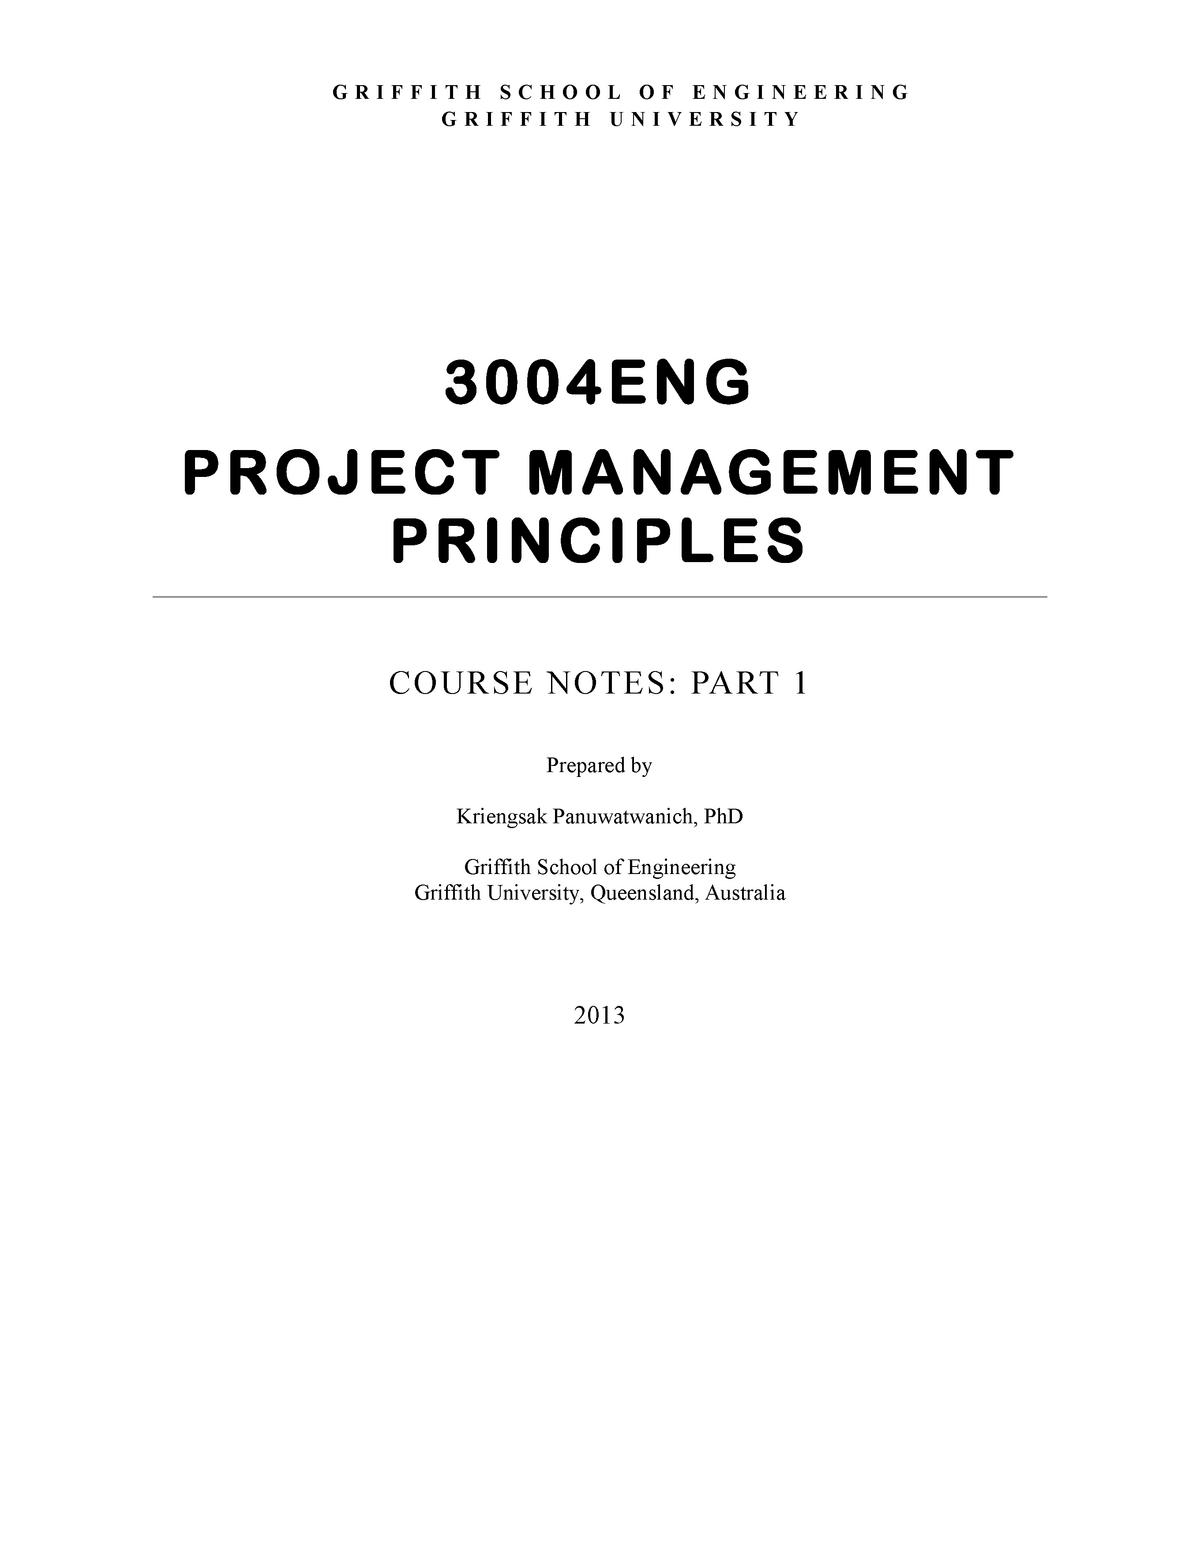 Lecture notes - project management principles course notes